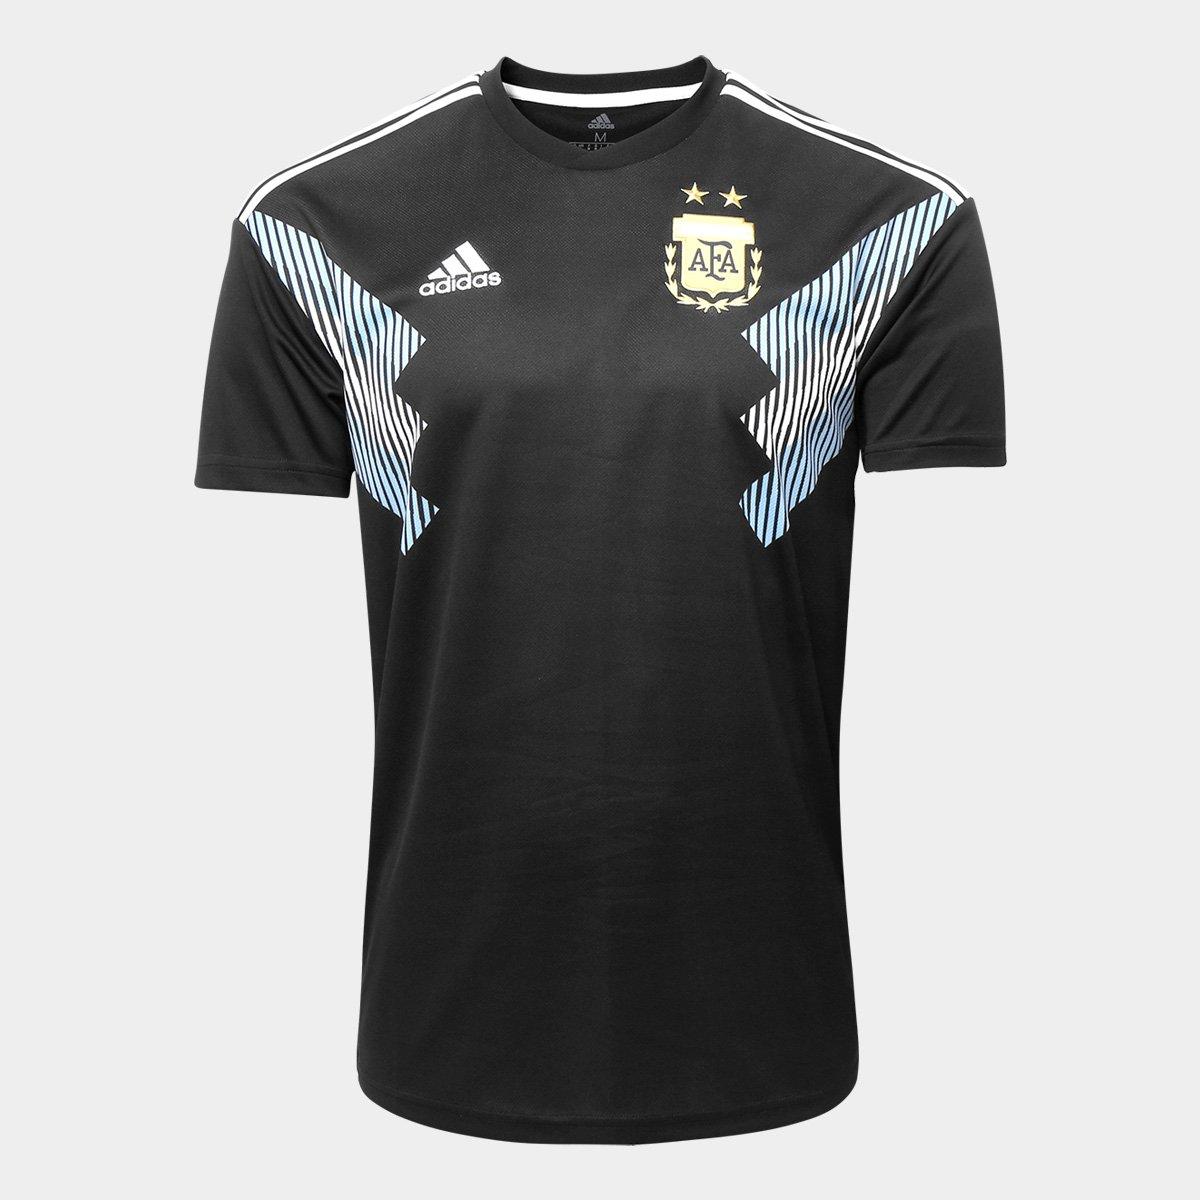 a7bf76025c Camisa Seleção Argentina Away 18 19 s n° - Torcedor Adidas Masculina ...